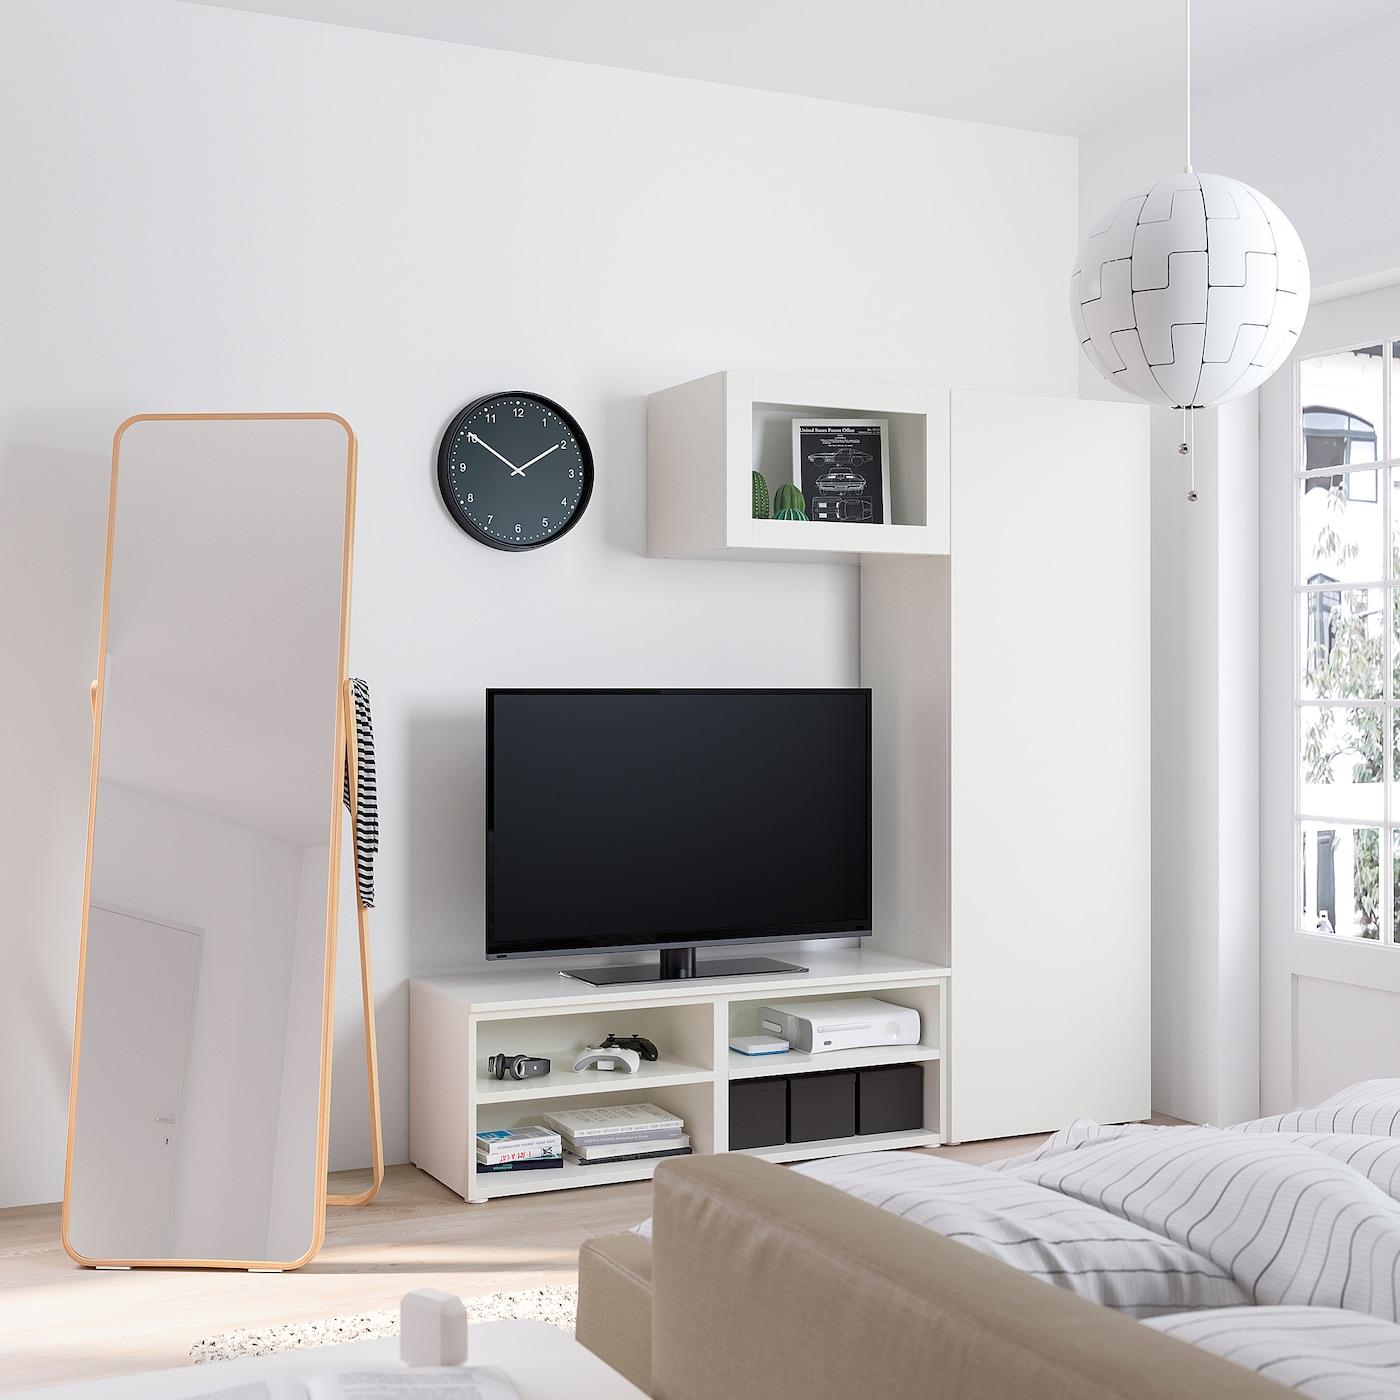 Platsa Combi Rangement Tv Avec 2 Portes Blanc Fonnes Vard Ikea Suisse